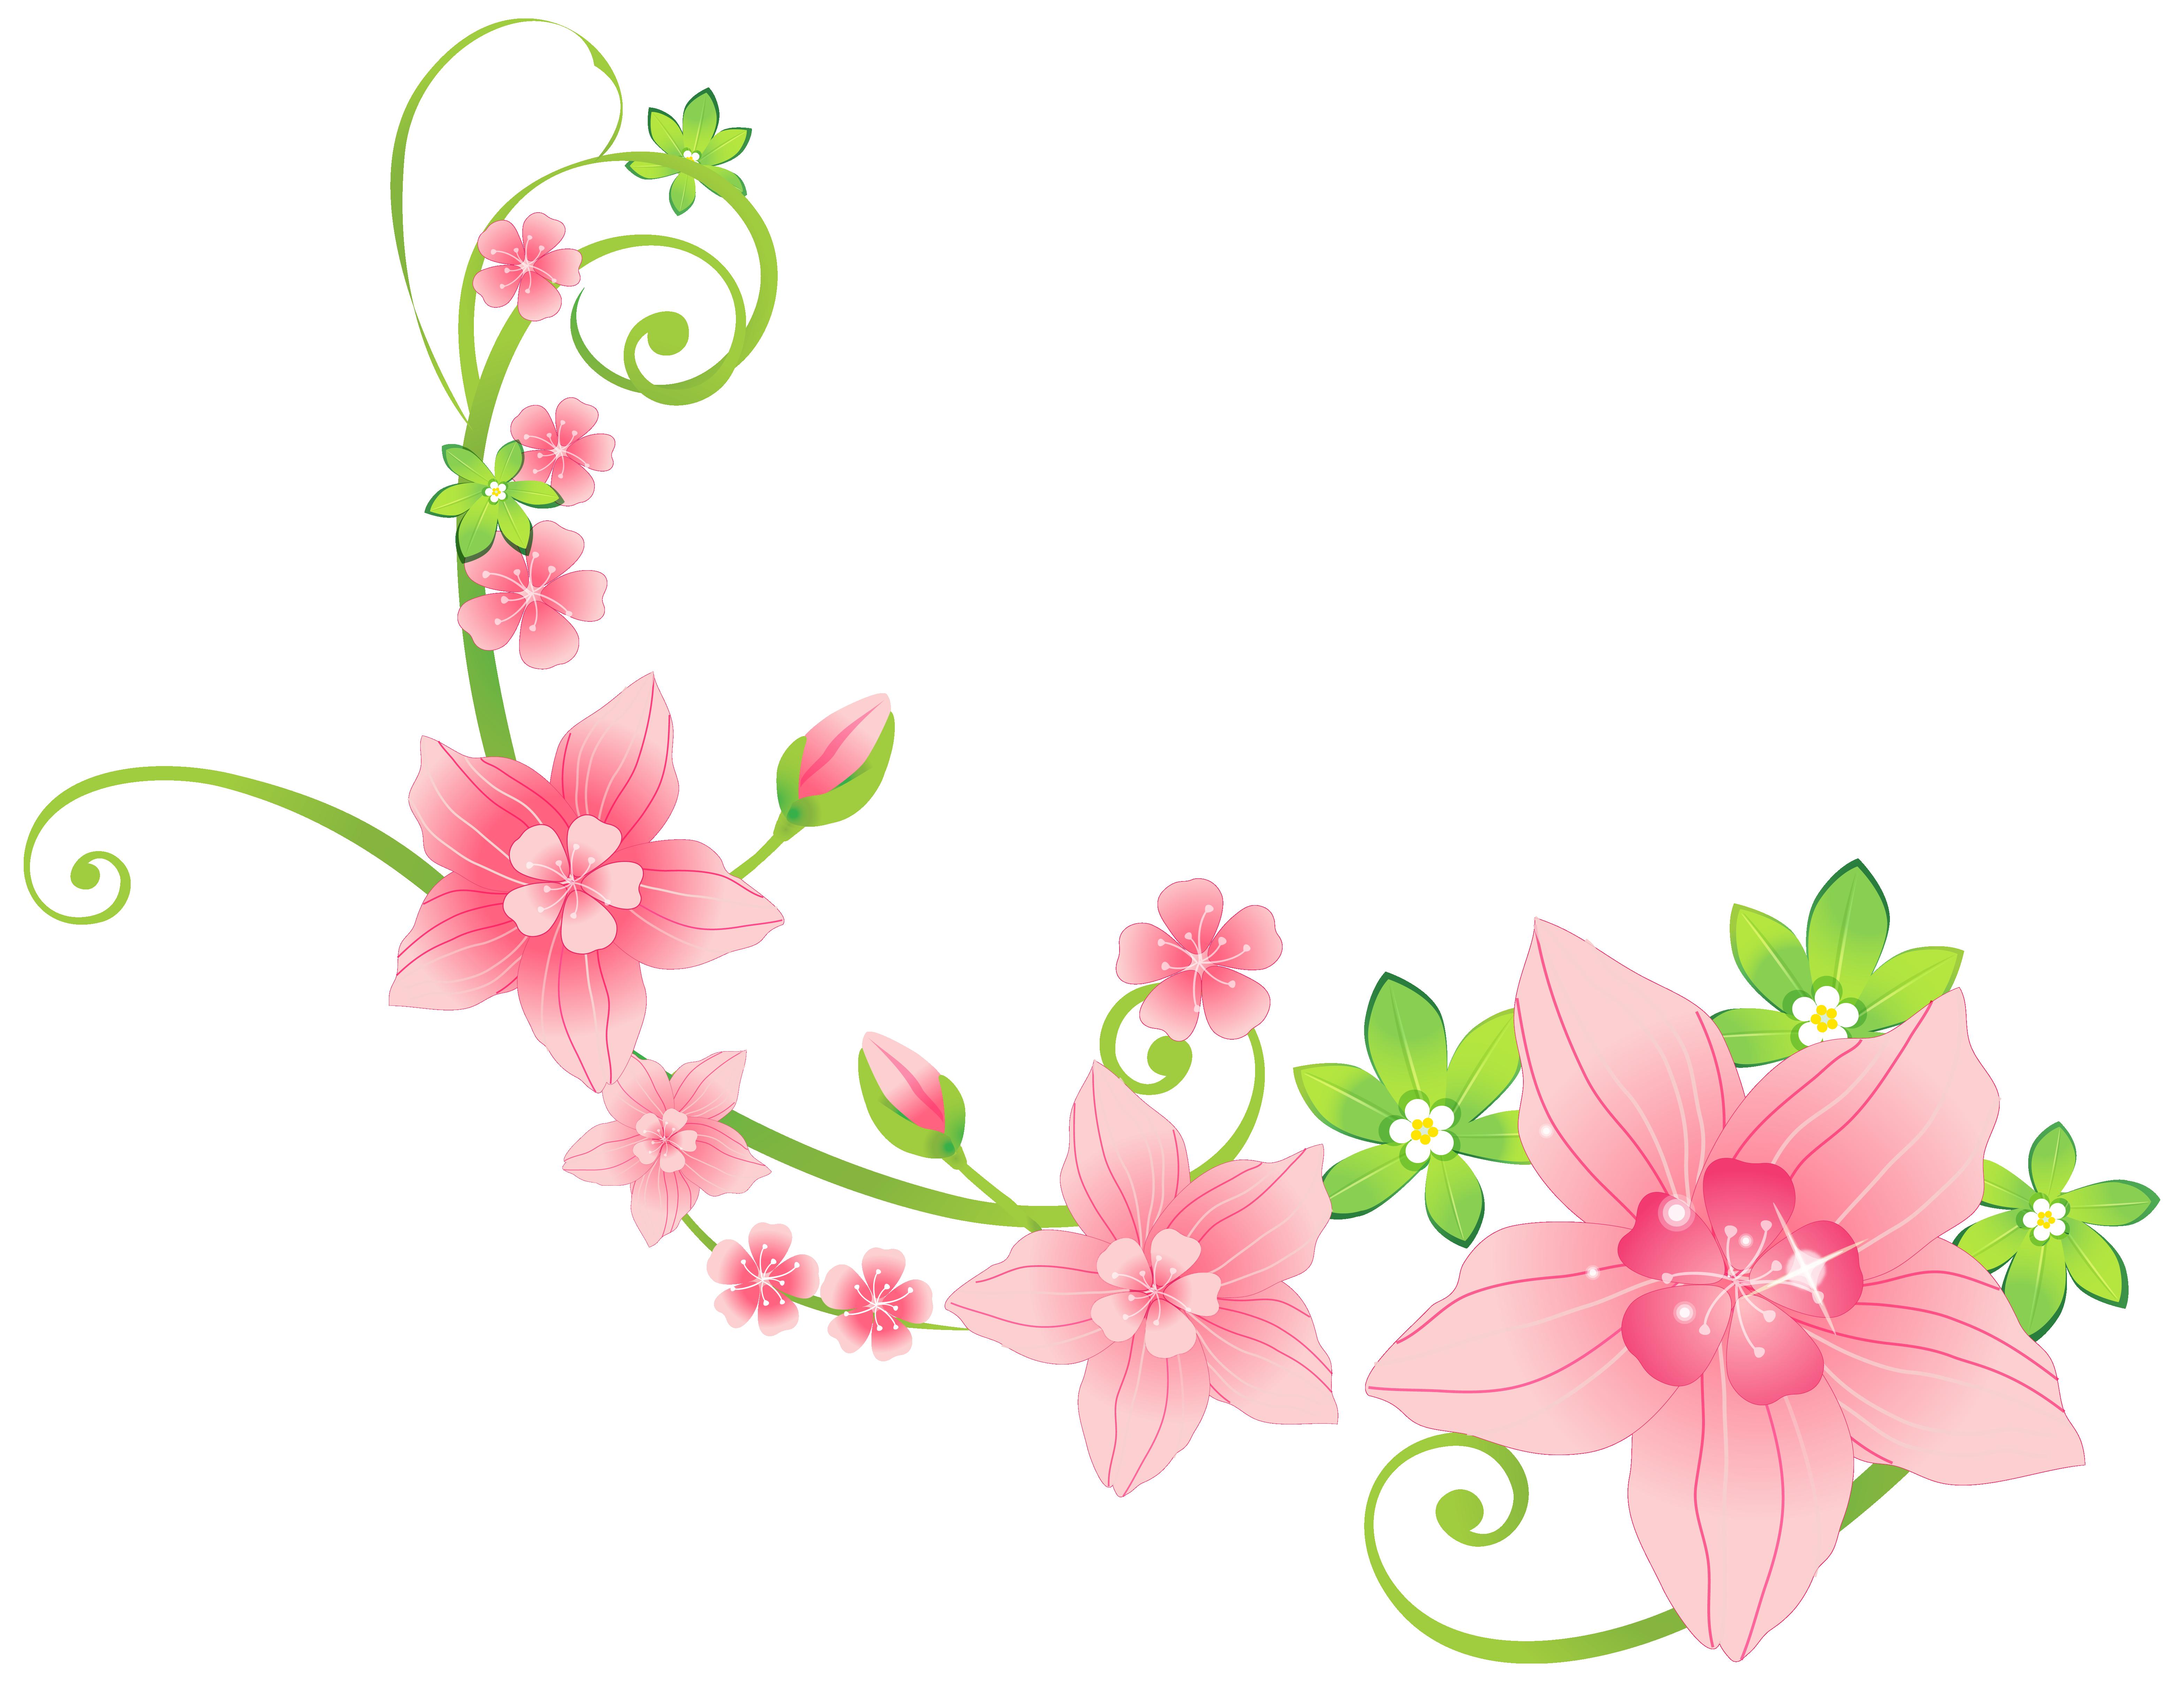 Flower decorations clipart graphic freeuse download Pink Floral Decoration PNG Clip-Art Image | flowers | Pinterest ... graphic freeuse download